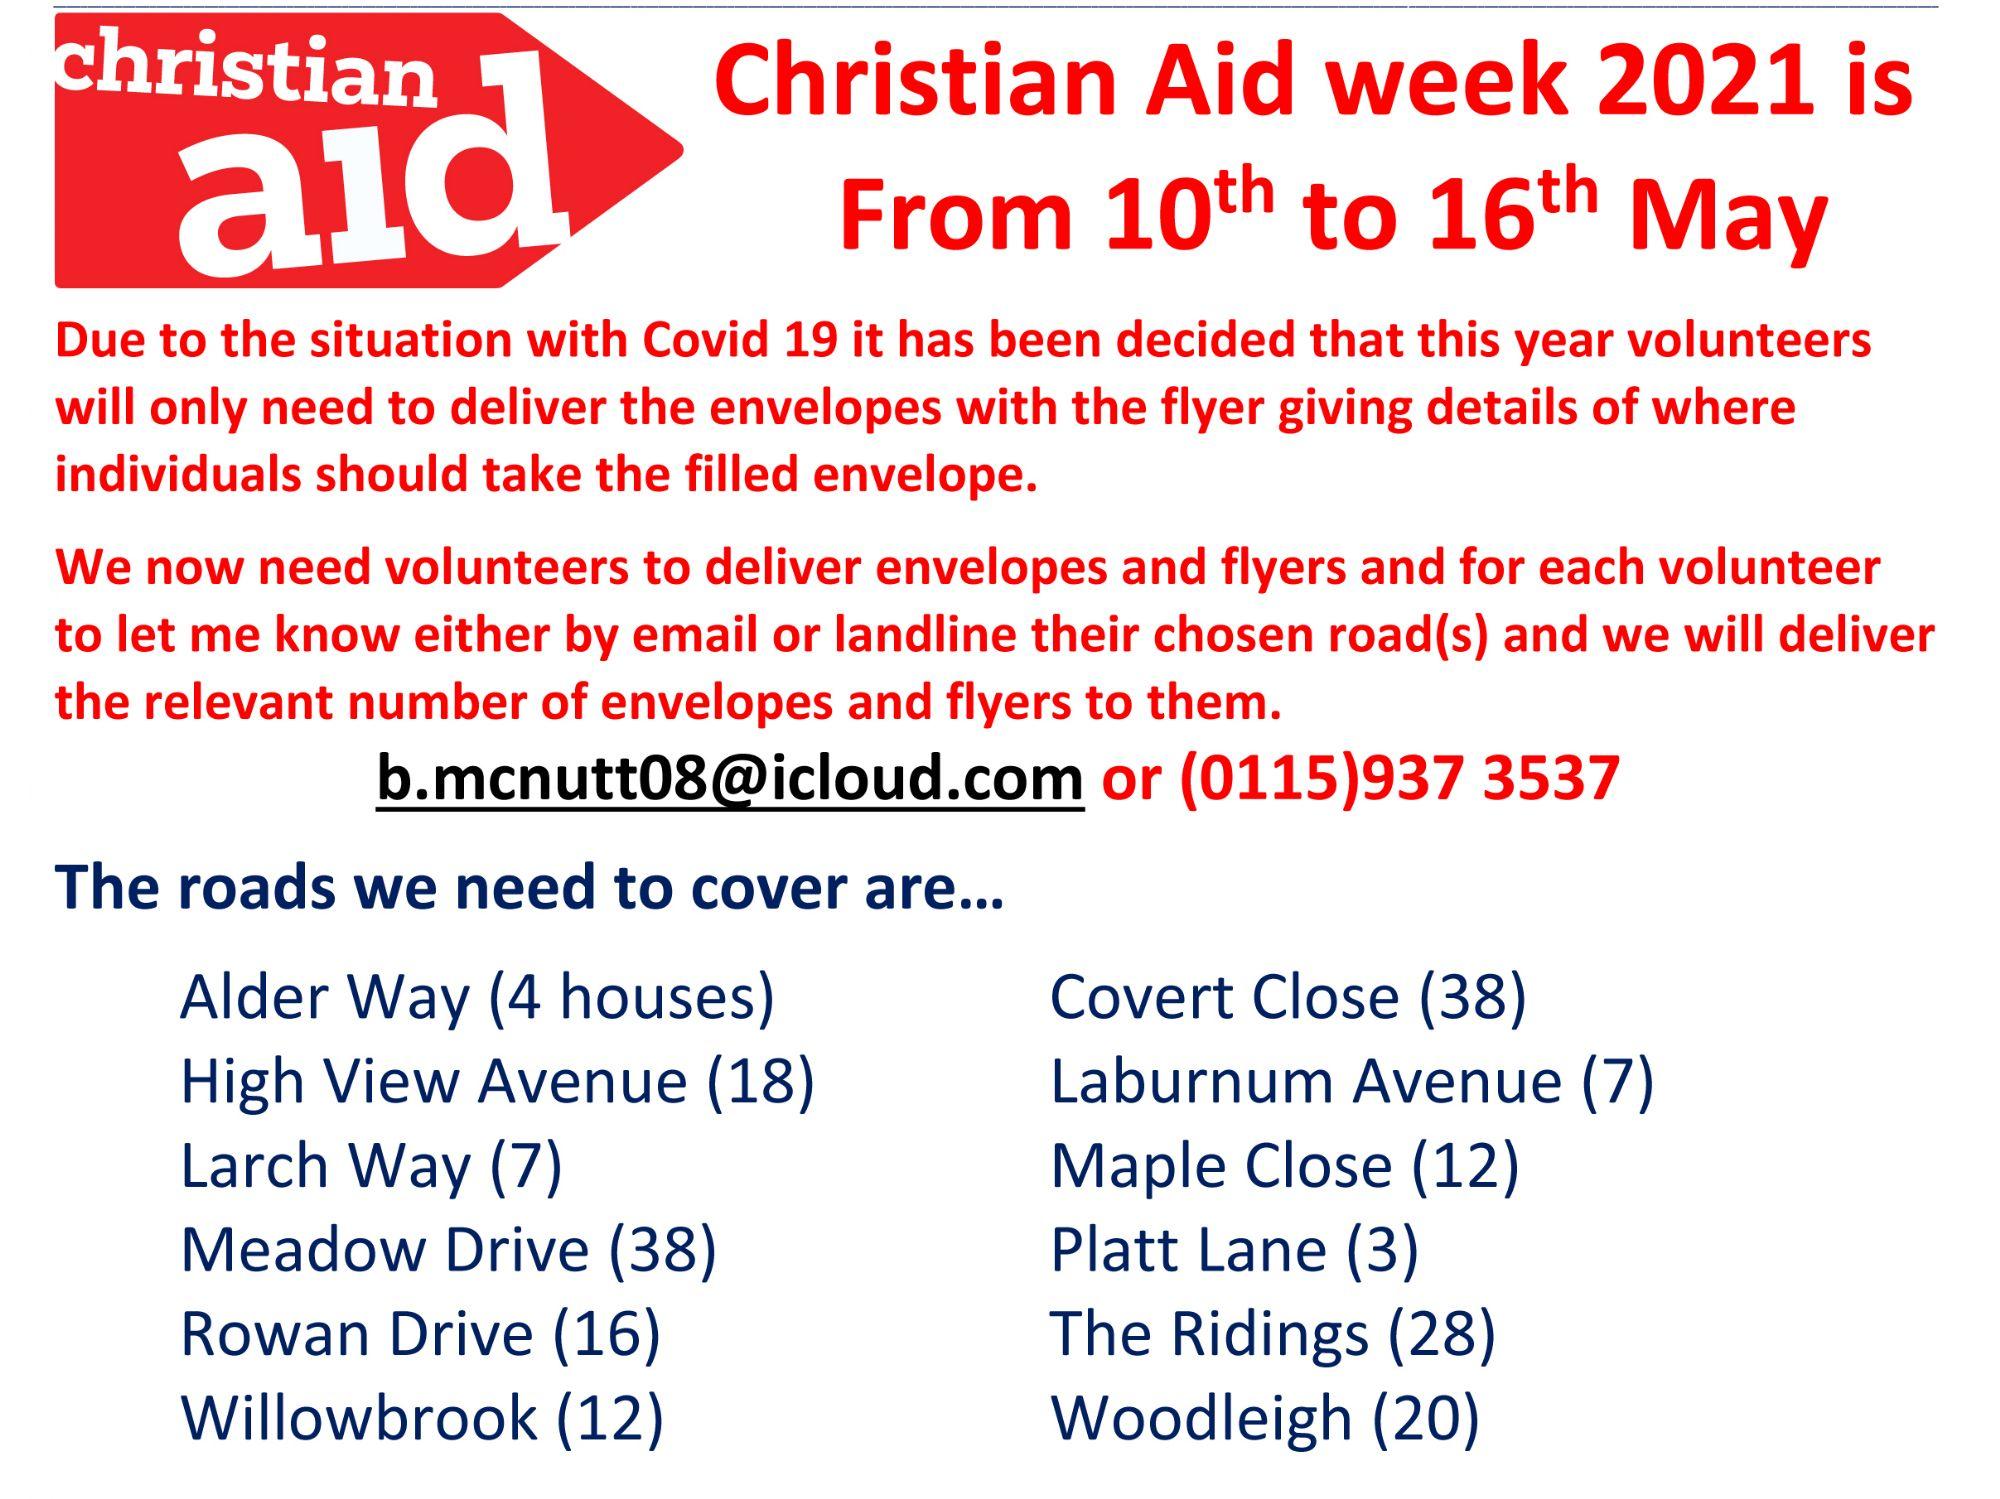 Christian Aid Week Information